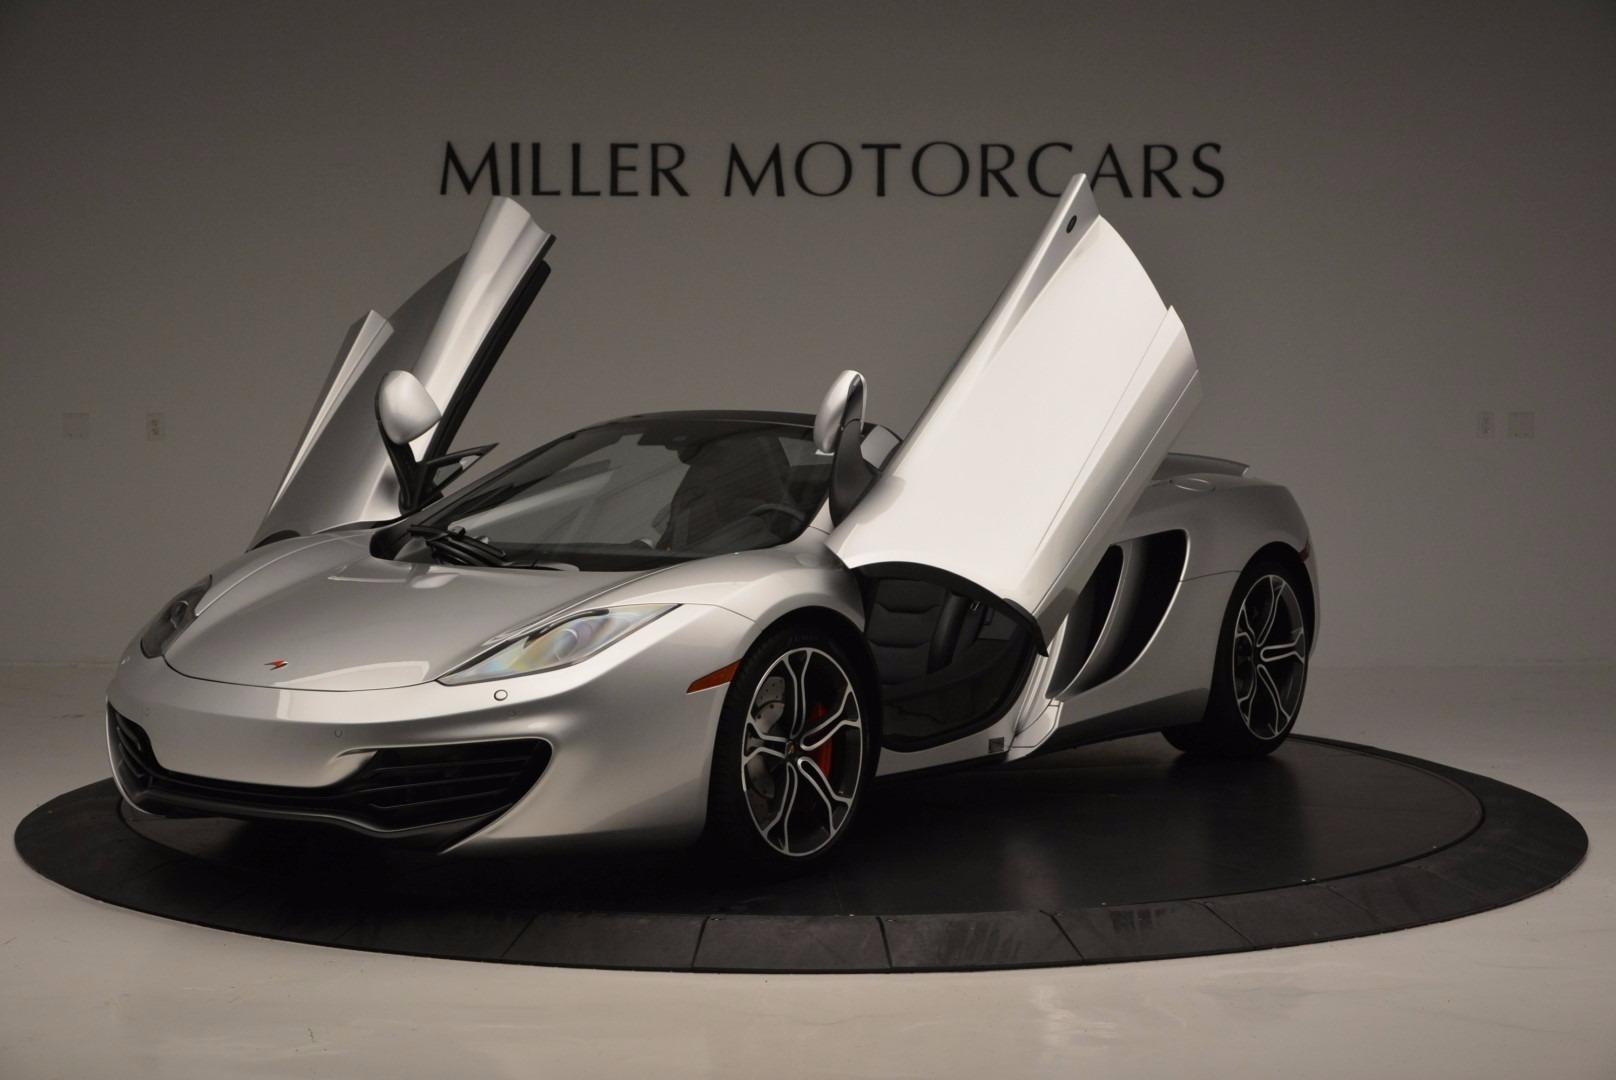 Used 2014 McLaren MP4-12C Spider  For Sale In Greenwich, CT. Alfa Romeo of Greenwich, 3089 627_p14